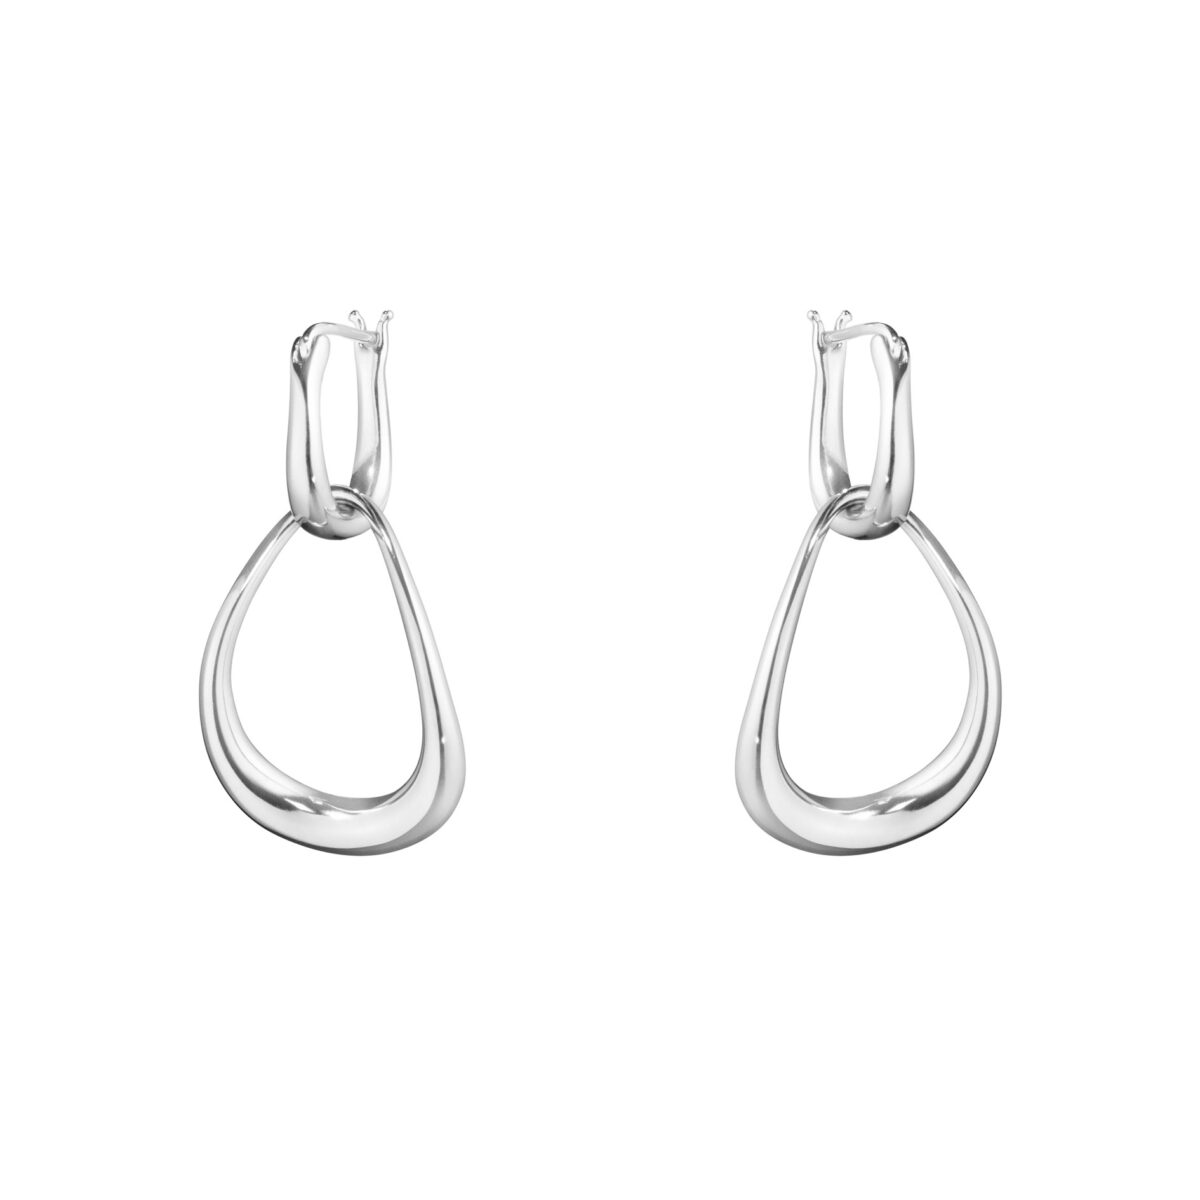 product/1/0/10012754_offspring_earring_433c_silver_jpg_max_3000x3000_423927.jpg